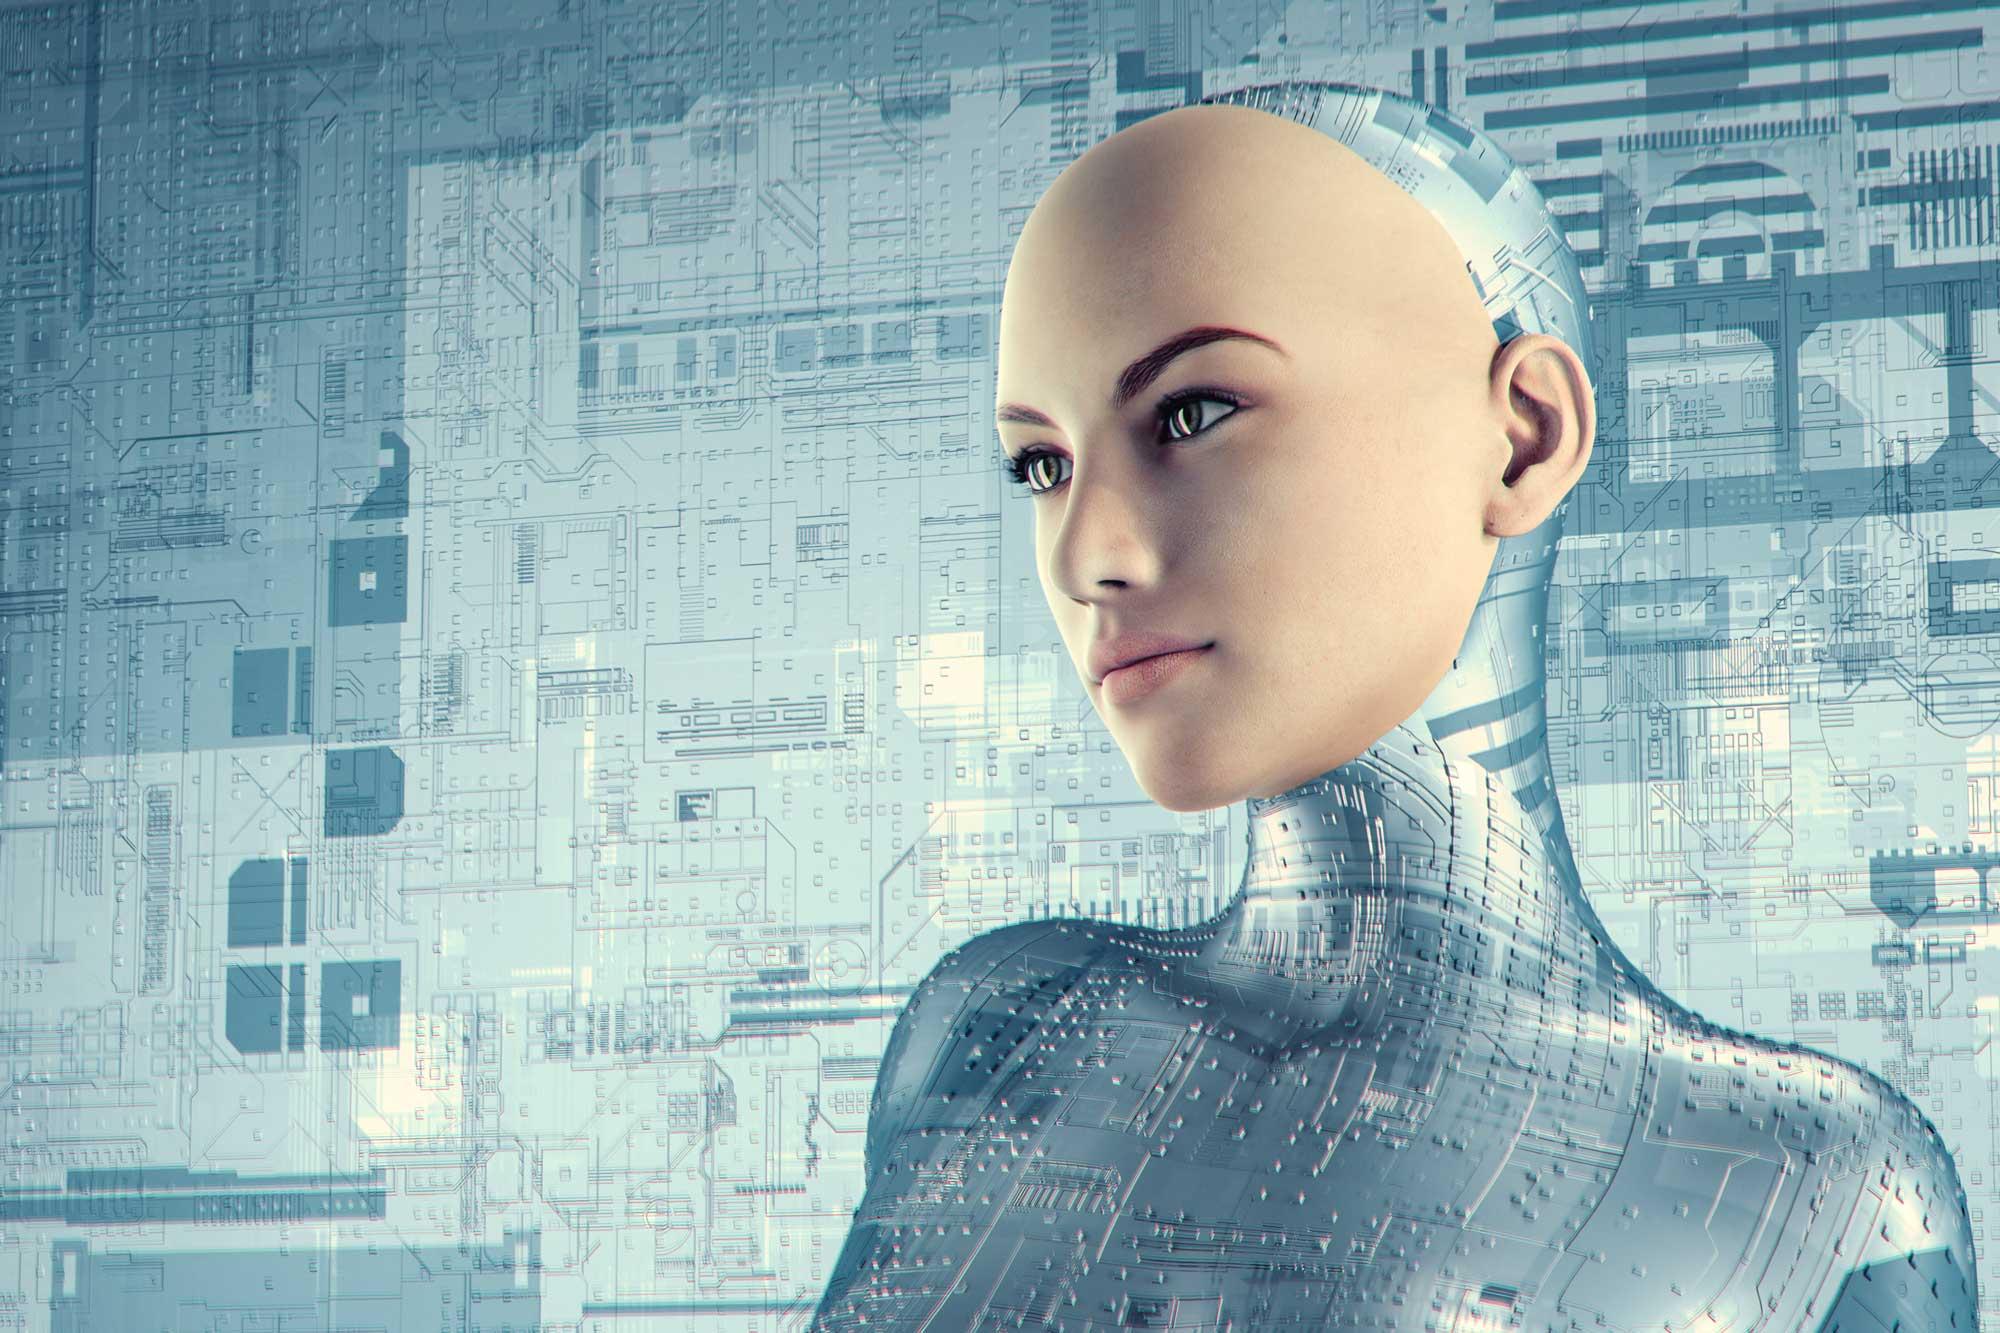 Tele Inteligencia Asistida (TIA)